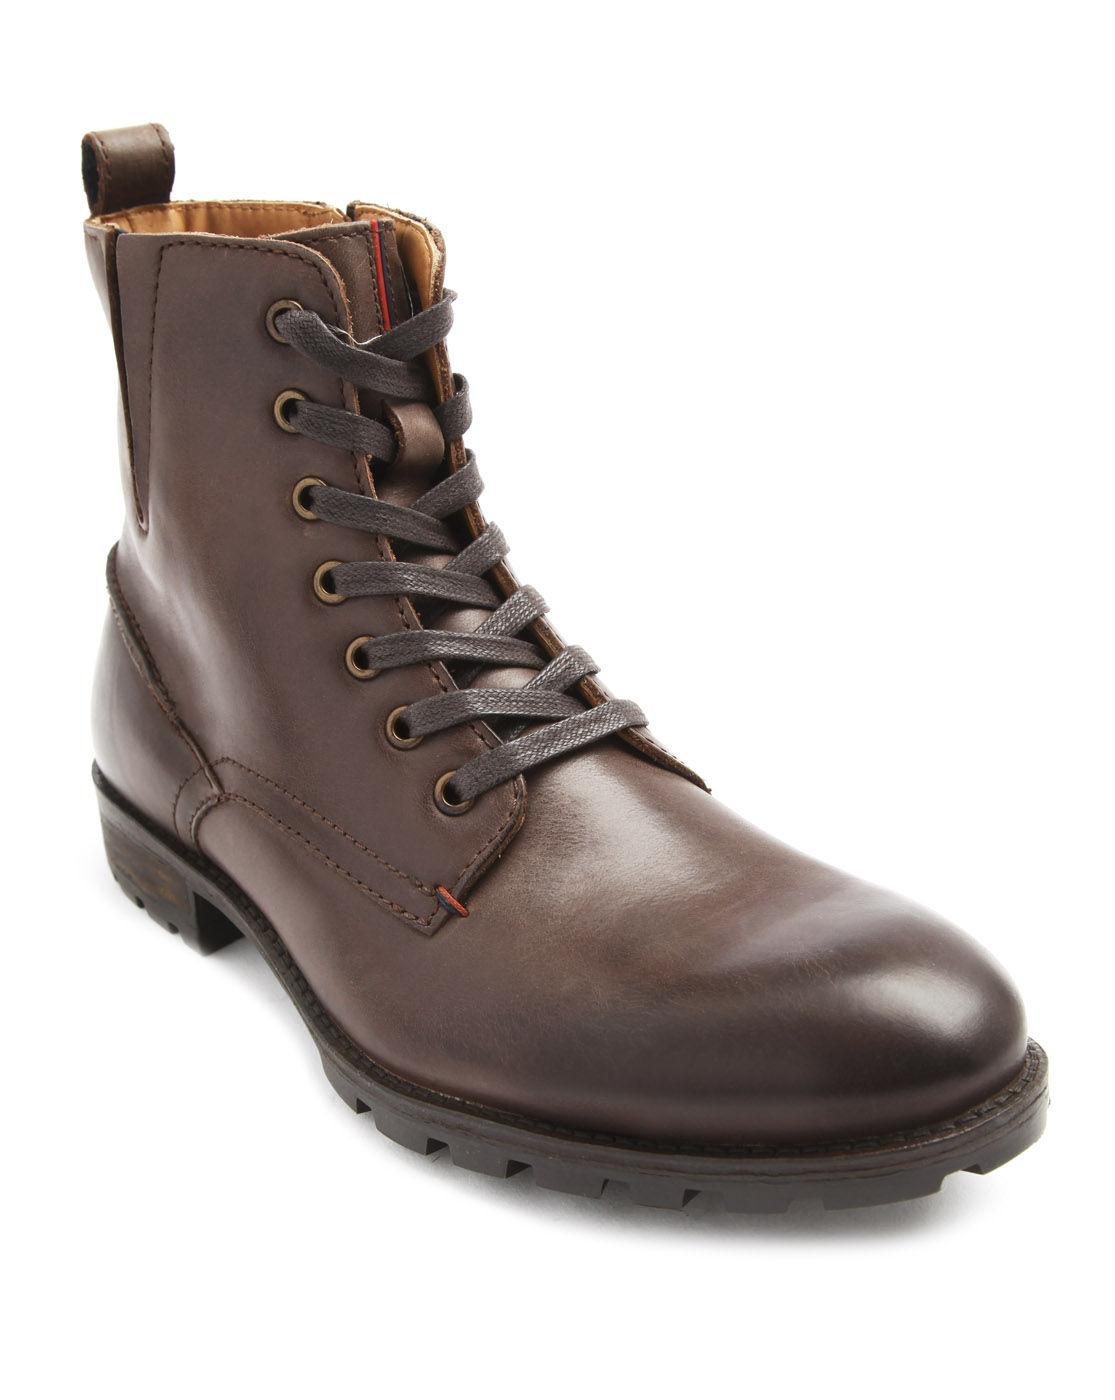 tommy hilfiger darren brown zipped boots in brown for men lyst. Black Bedroom Furniture Sets. Home Design Ideas